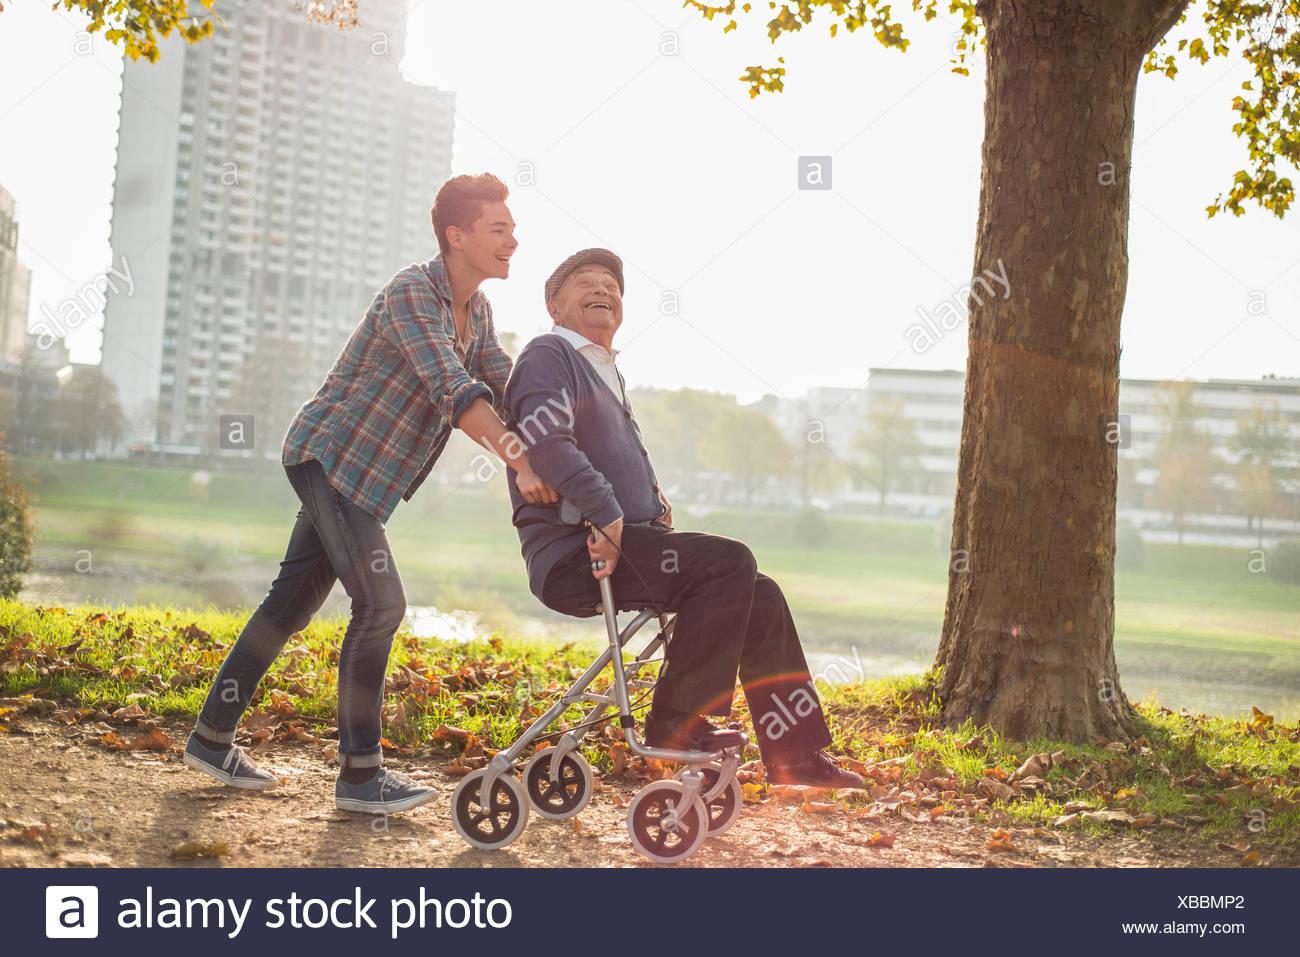 Grandson pushing happy senior man with wheeled walker - Stock Image